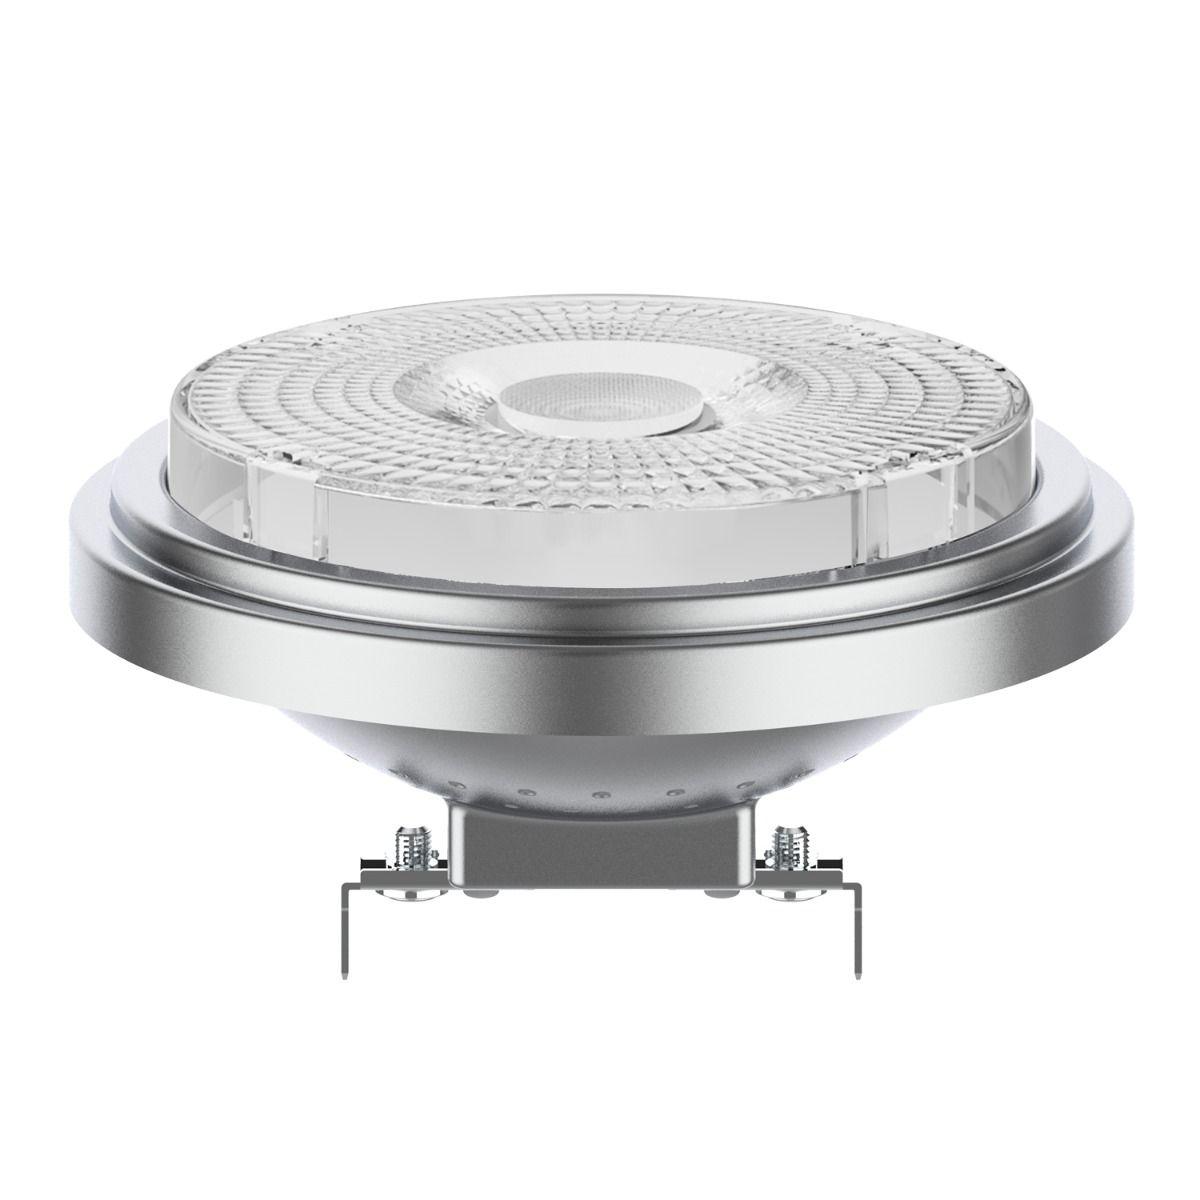 Noxion Lucent LED-Spot AR111 G53 12V 7.3W 930 40D | Dimmbar - Höchste Farbwiedergabe - Ersatz für 50W